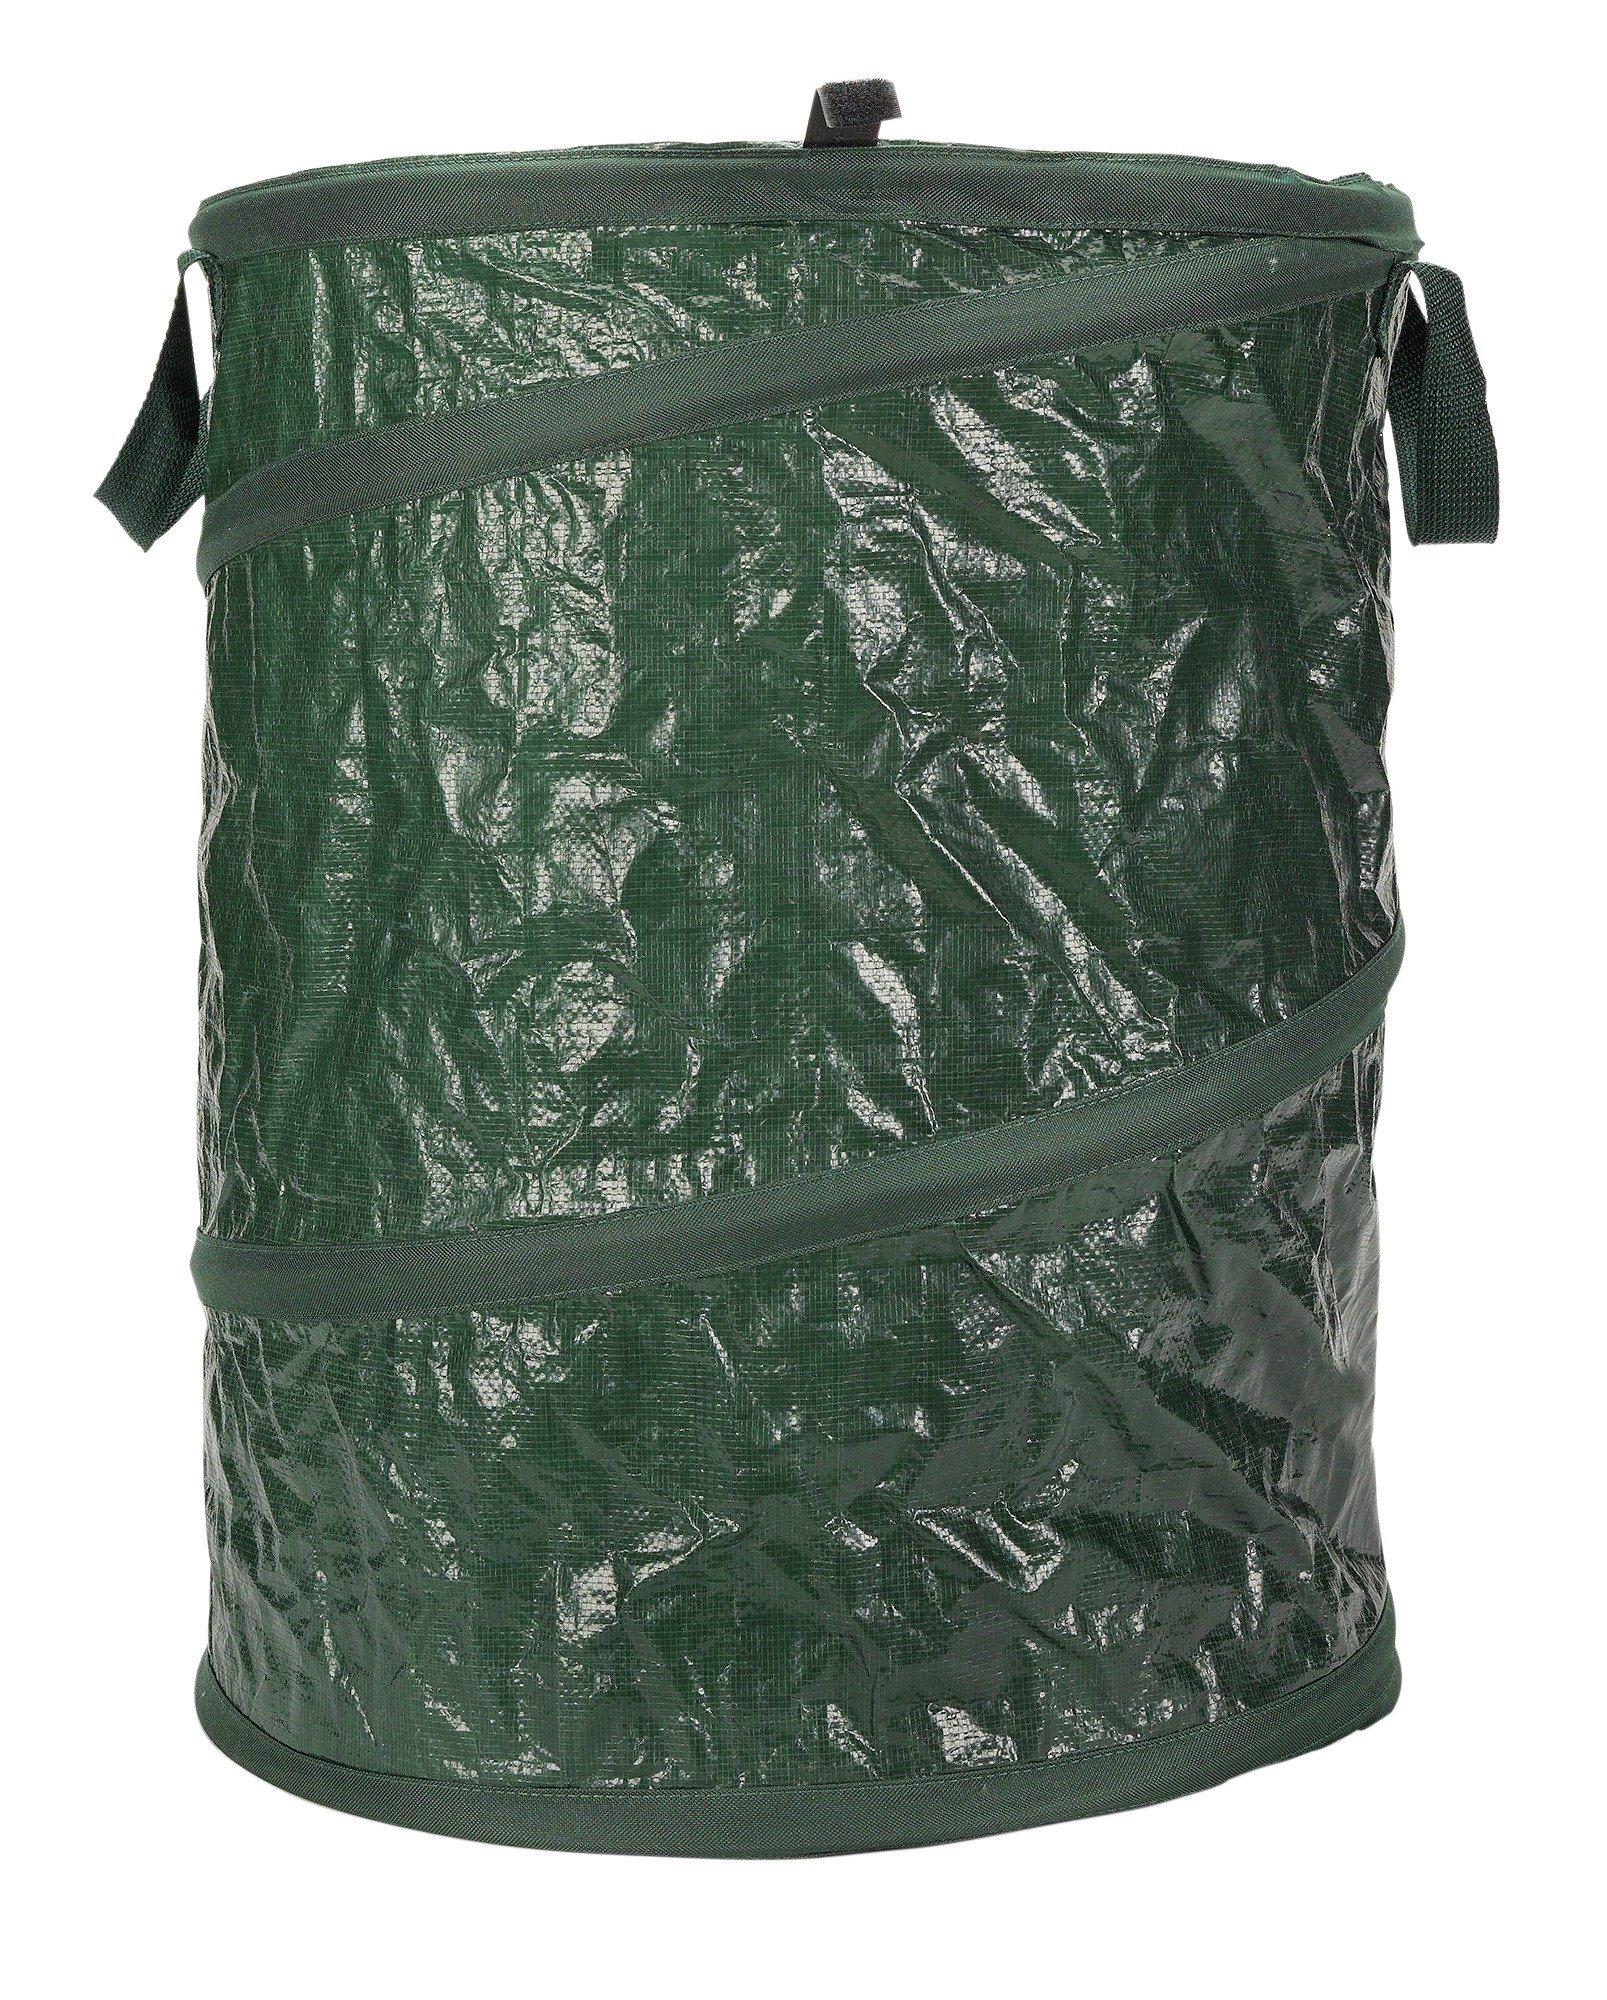 Image of Green Garden Tidy Pop Up Waste Bin